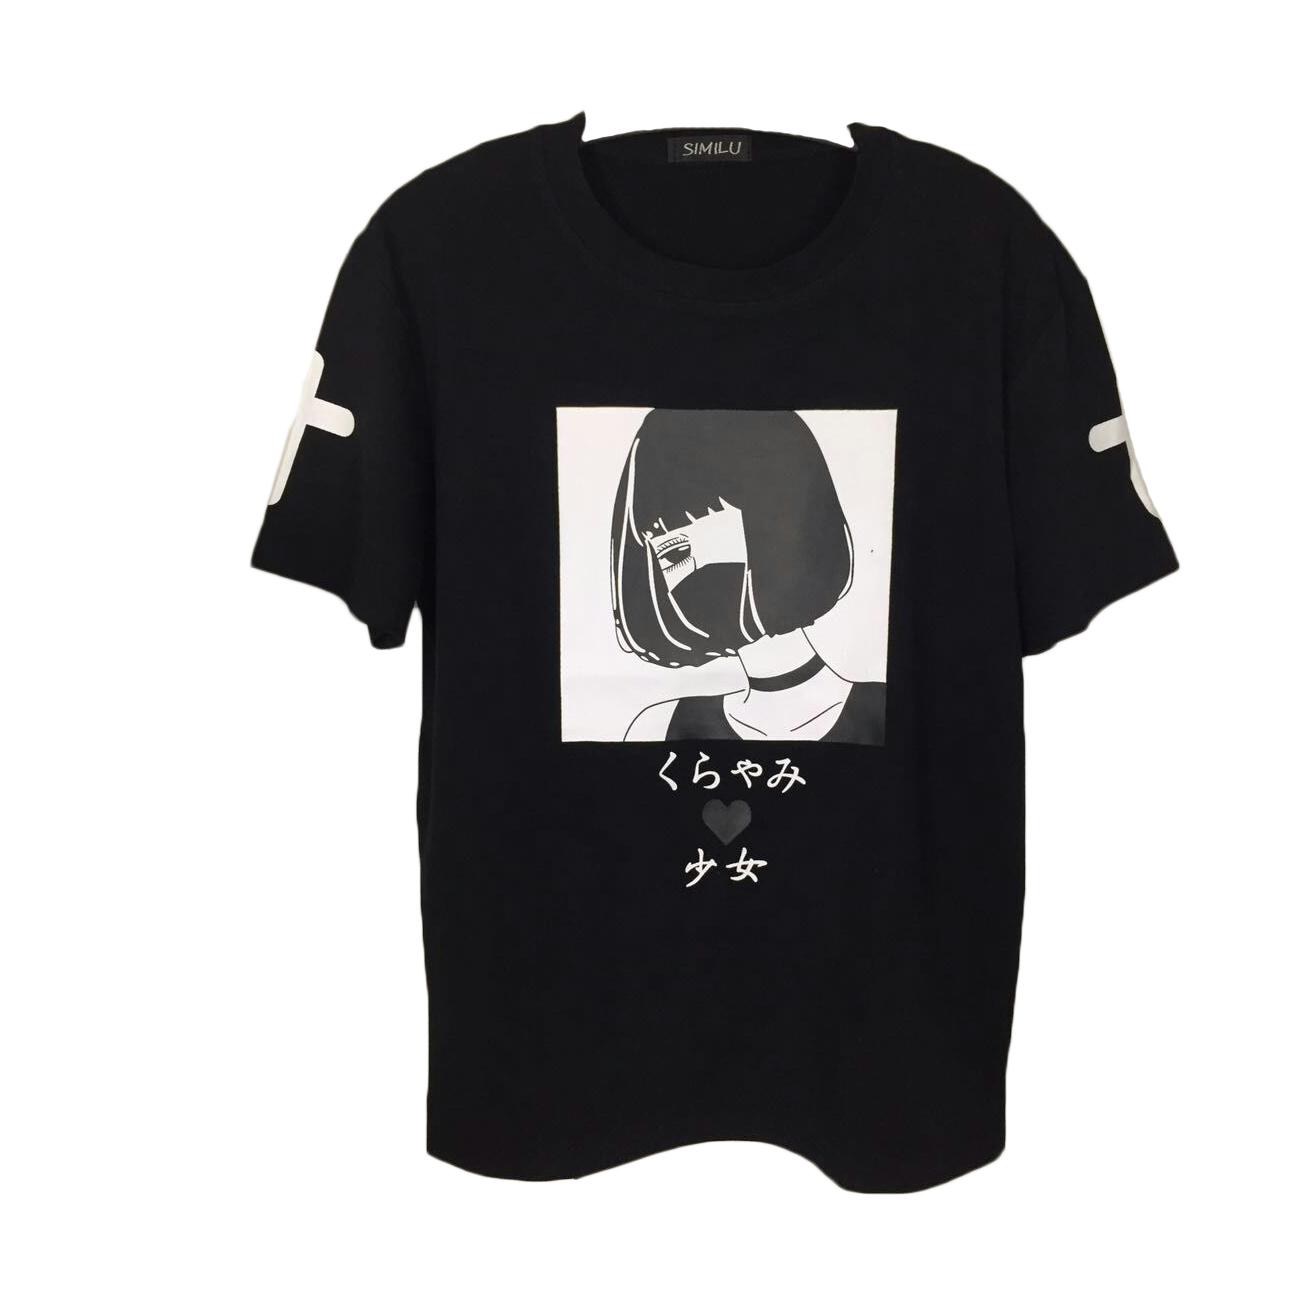 Mask Anime Shirt Japanese Tumblr Tee On Storenvy